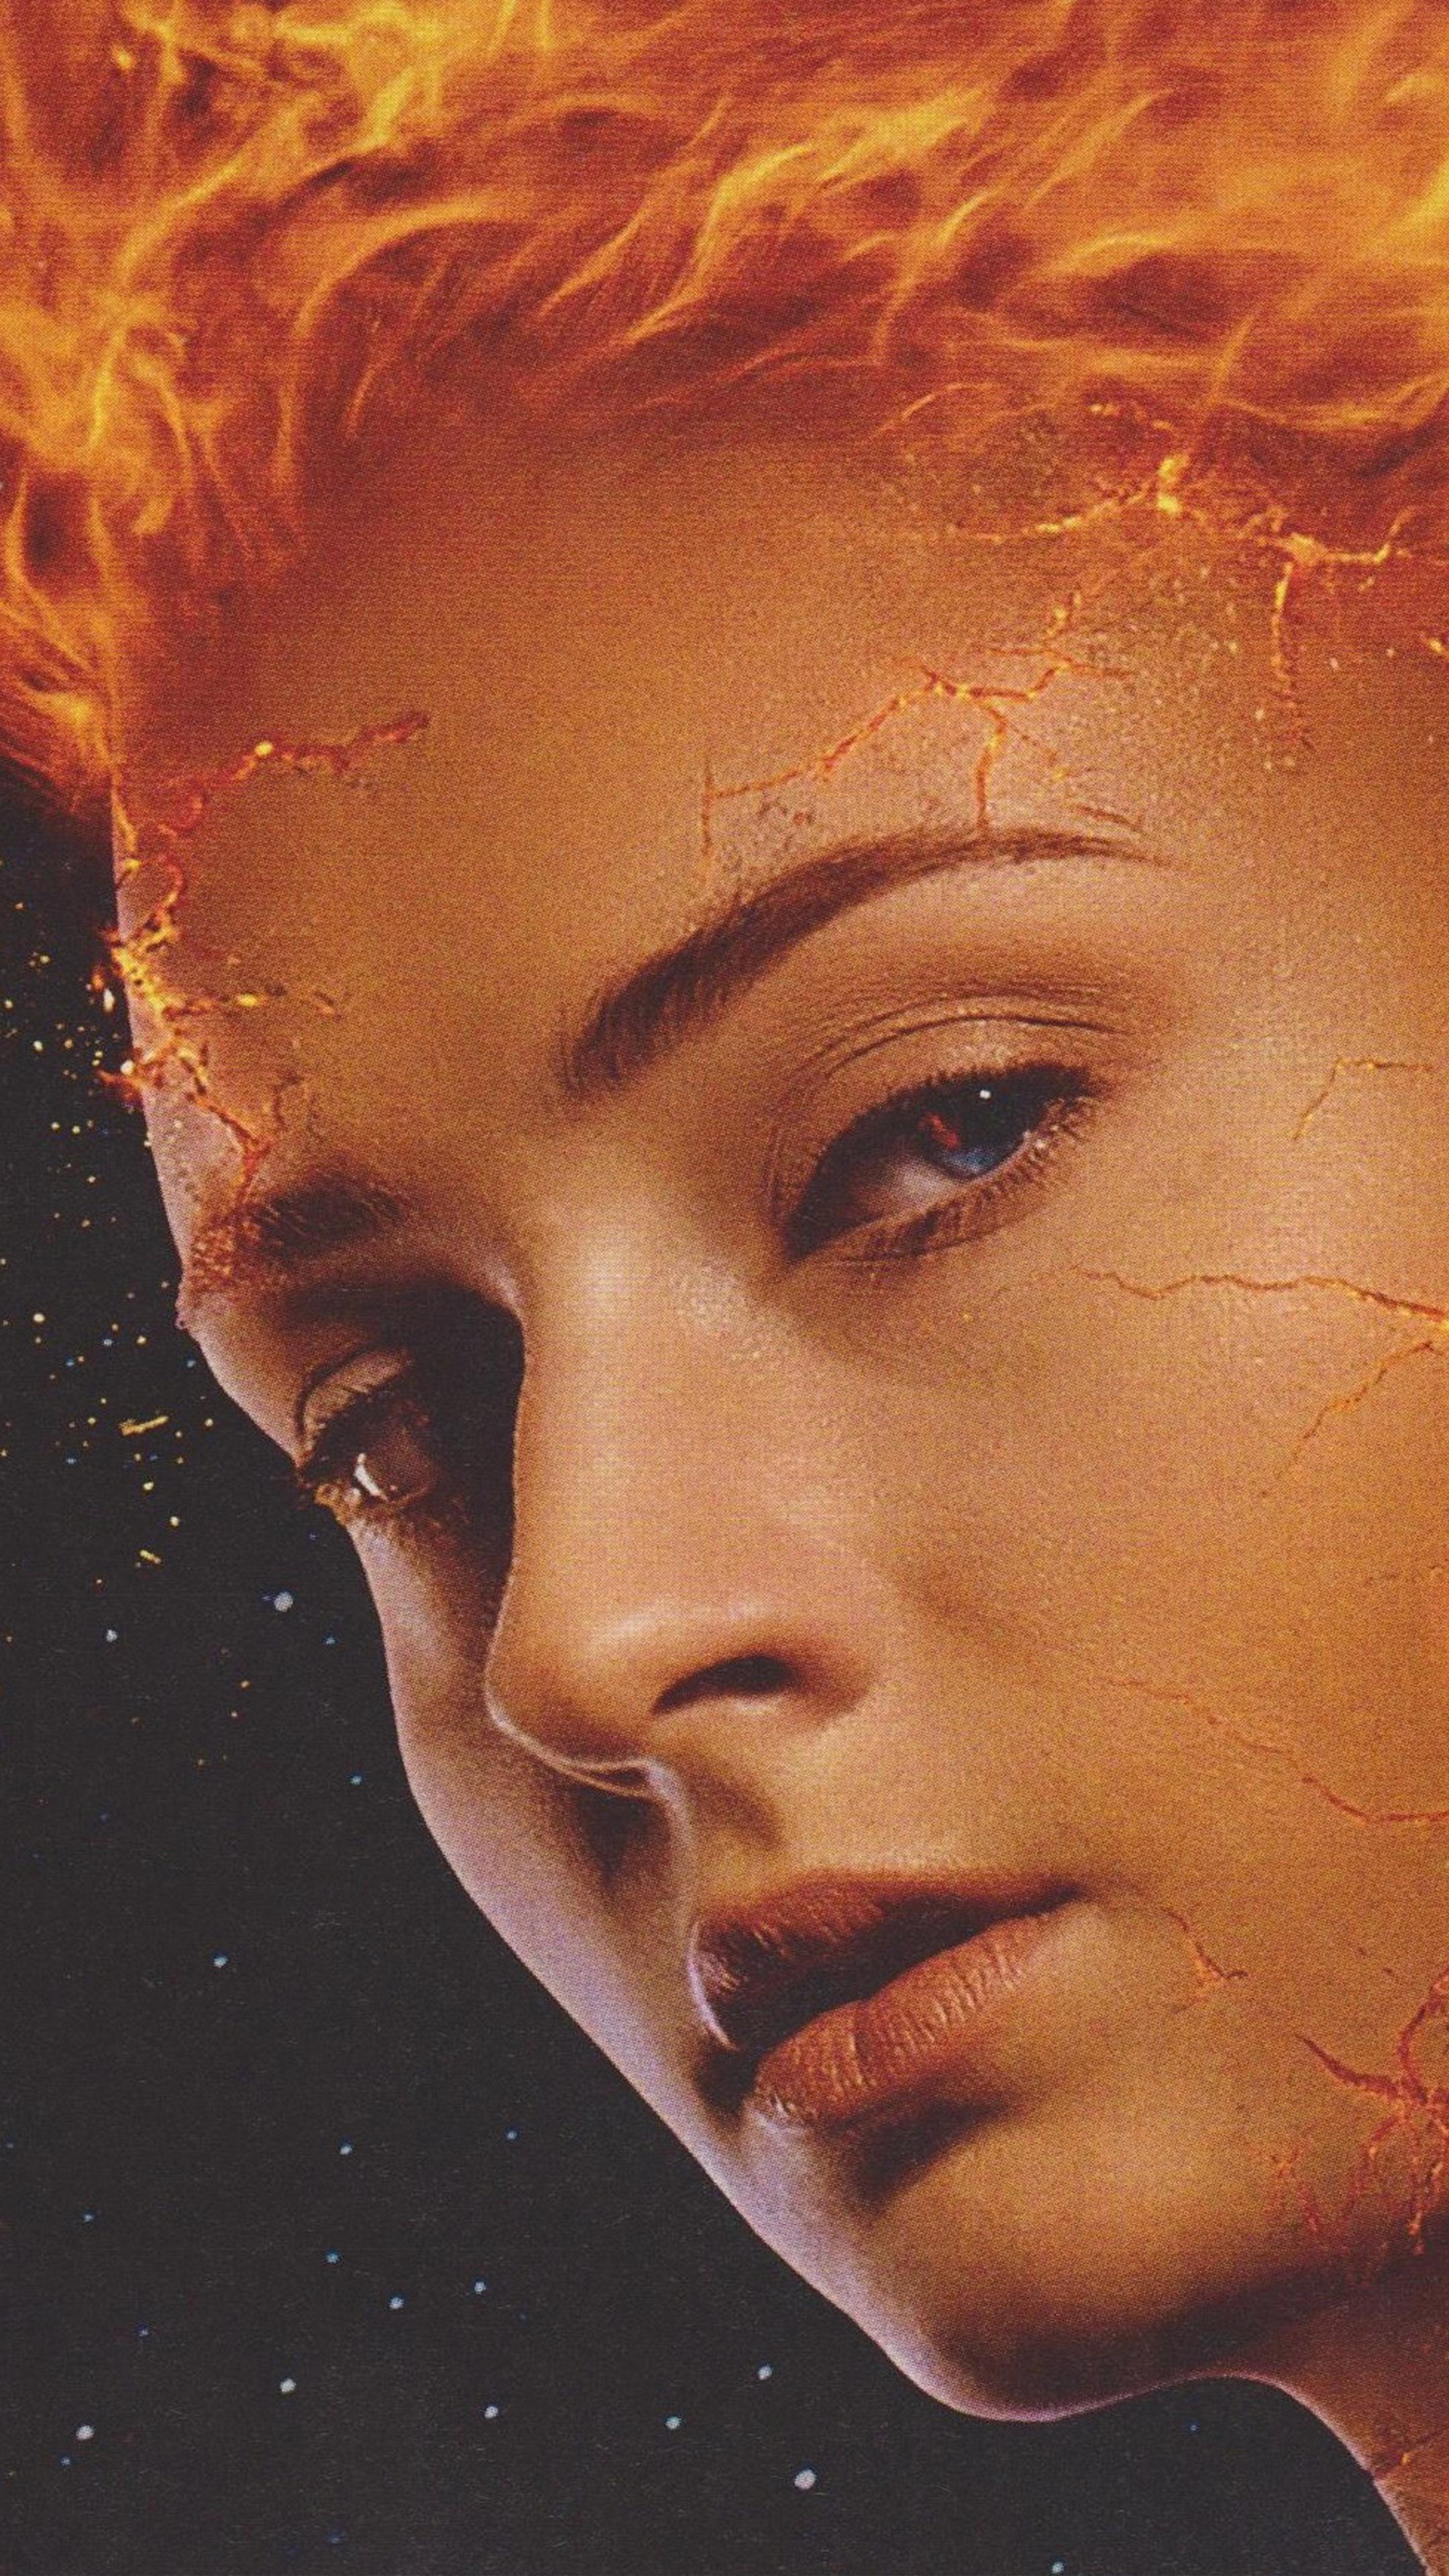 Sophie Turner In X Men Dark Phoenix Flame 4k Ultra Hd Mobile Wallpaper